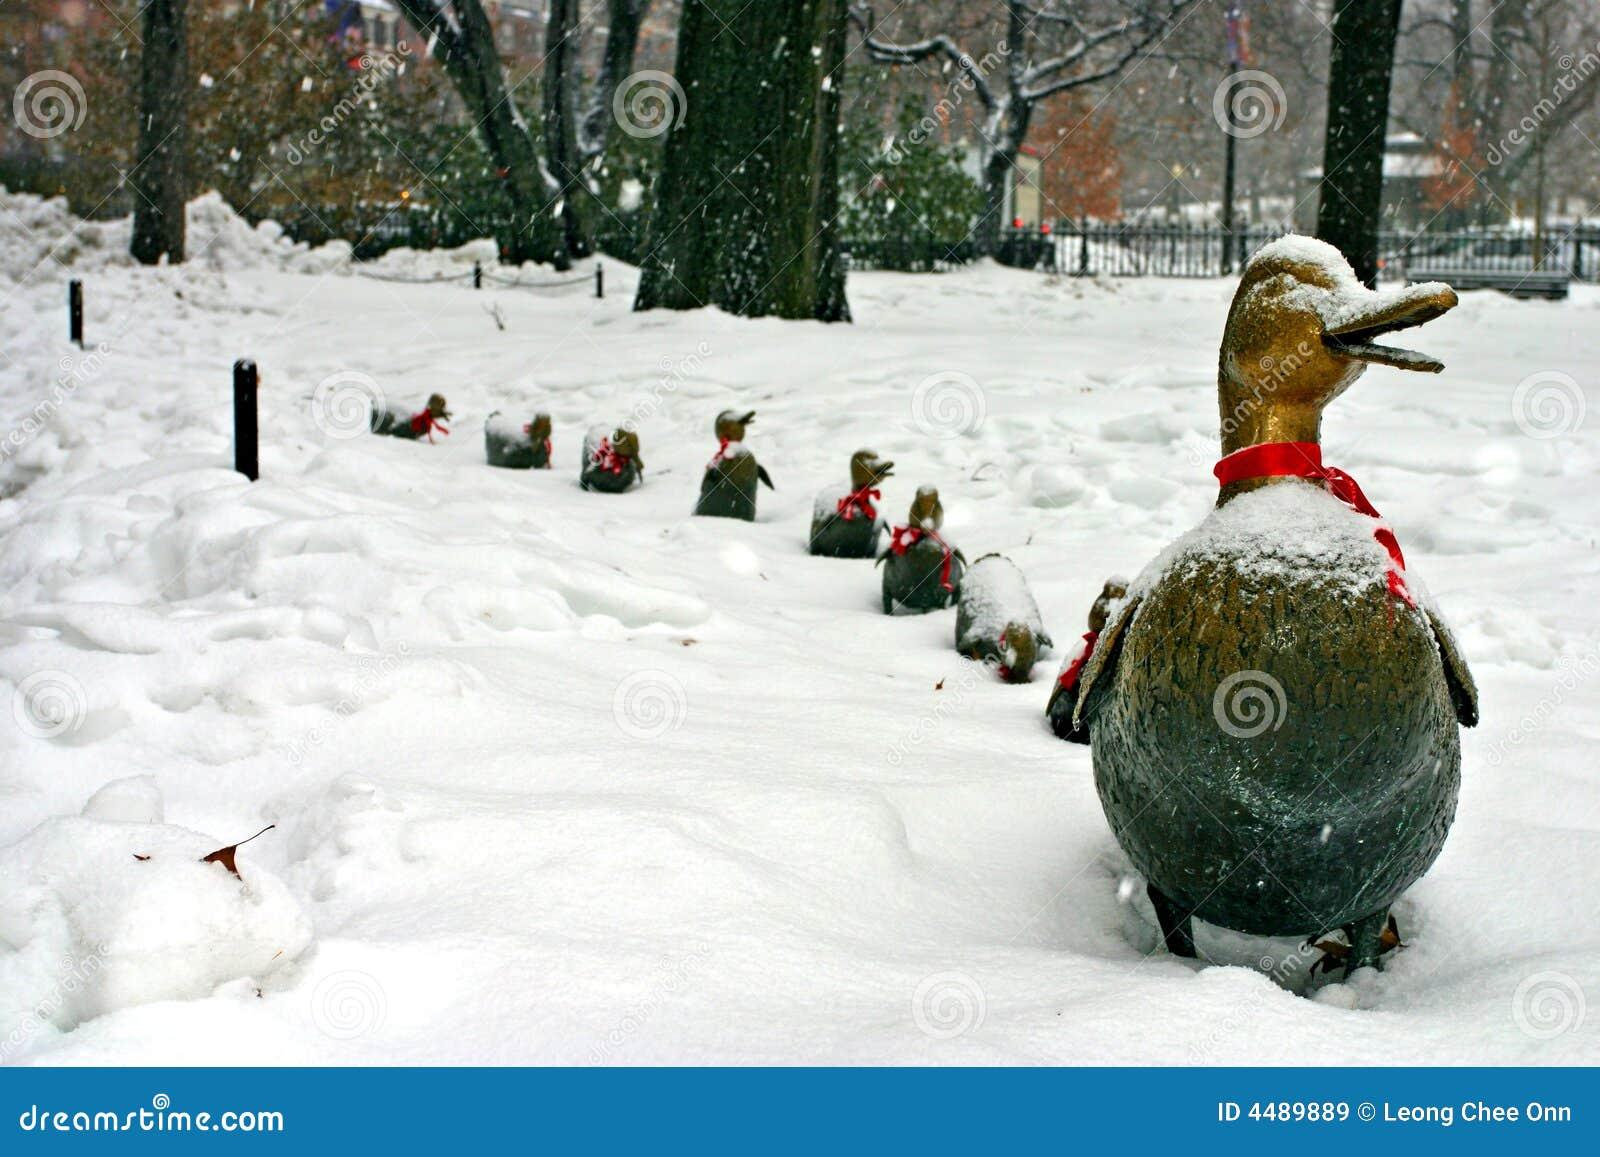 Stock image of a snowing winter at Boston, Massachusetts, USA.